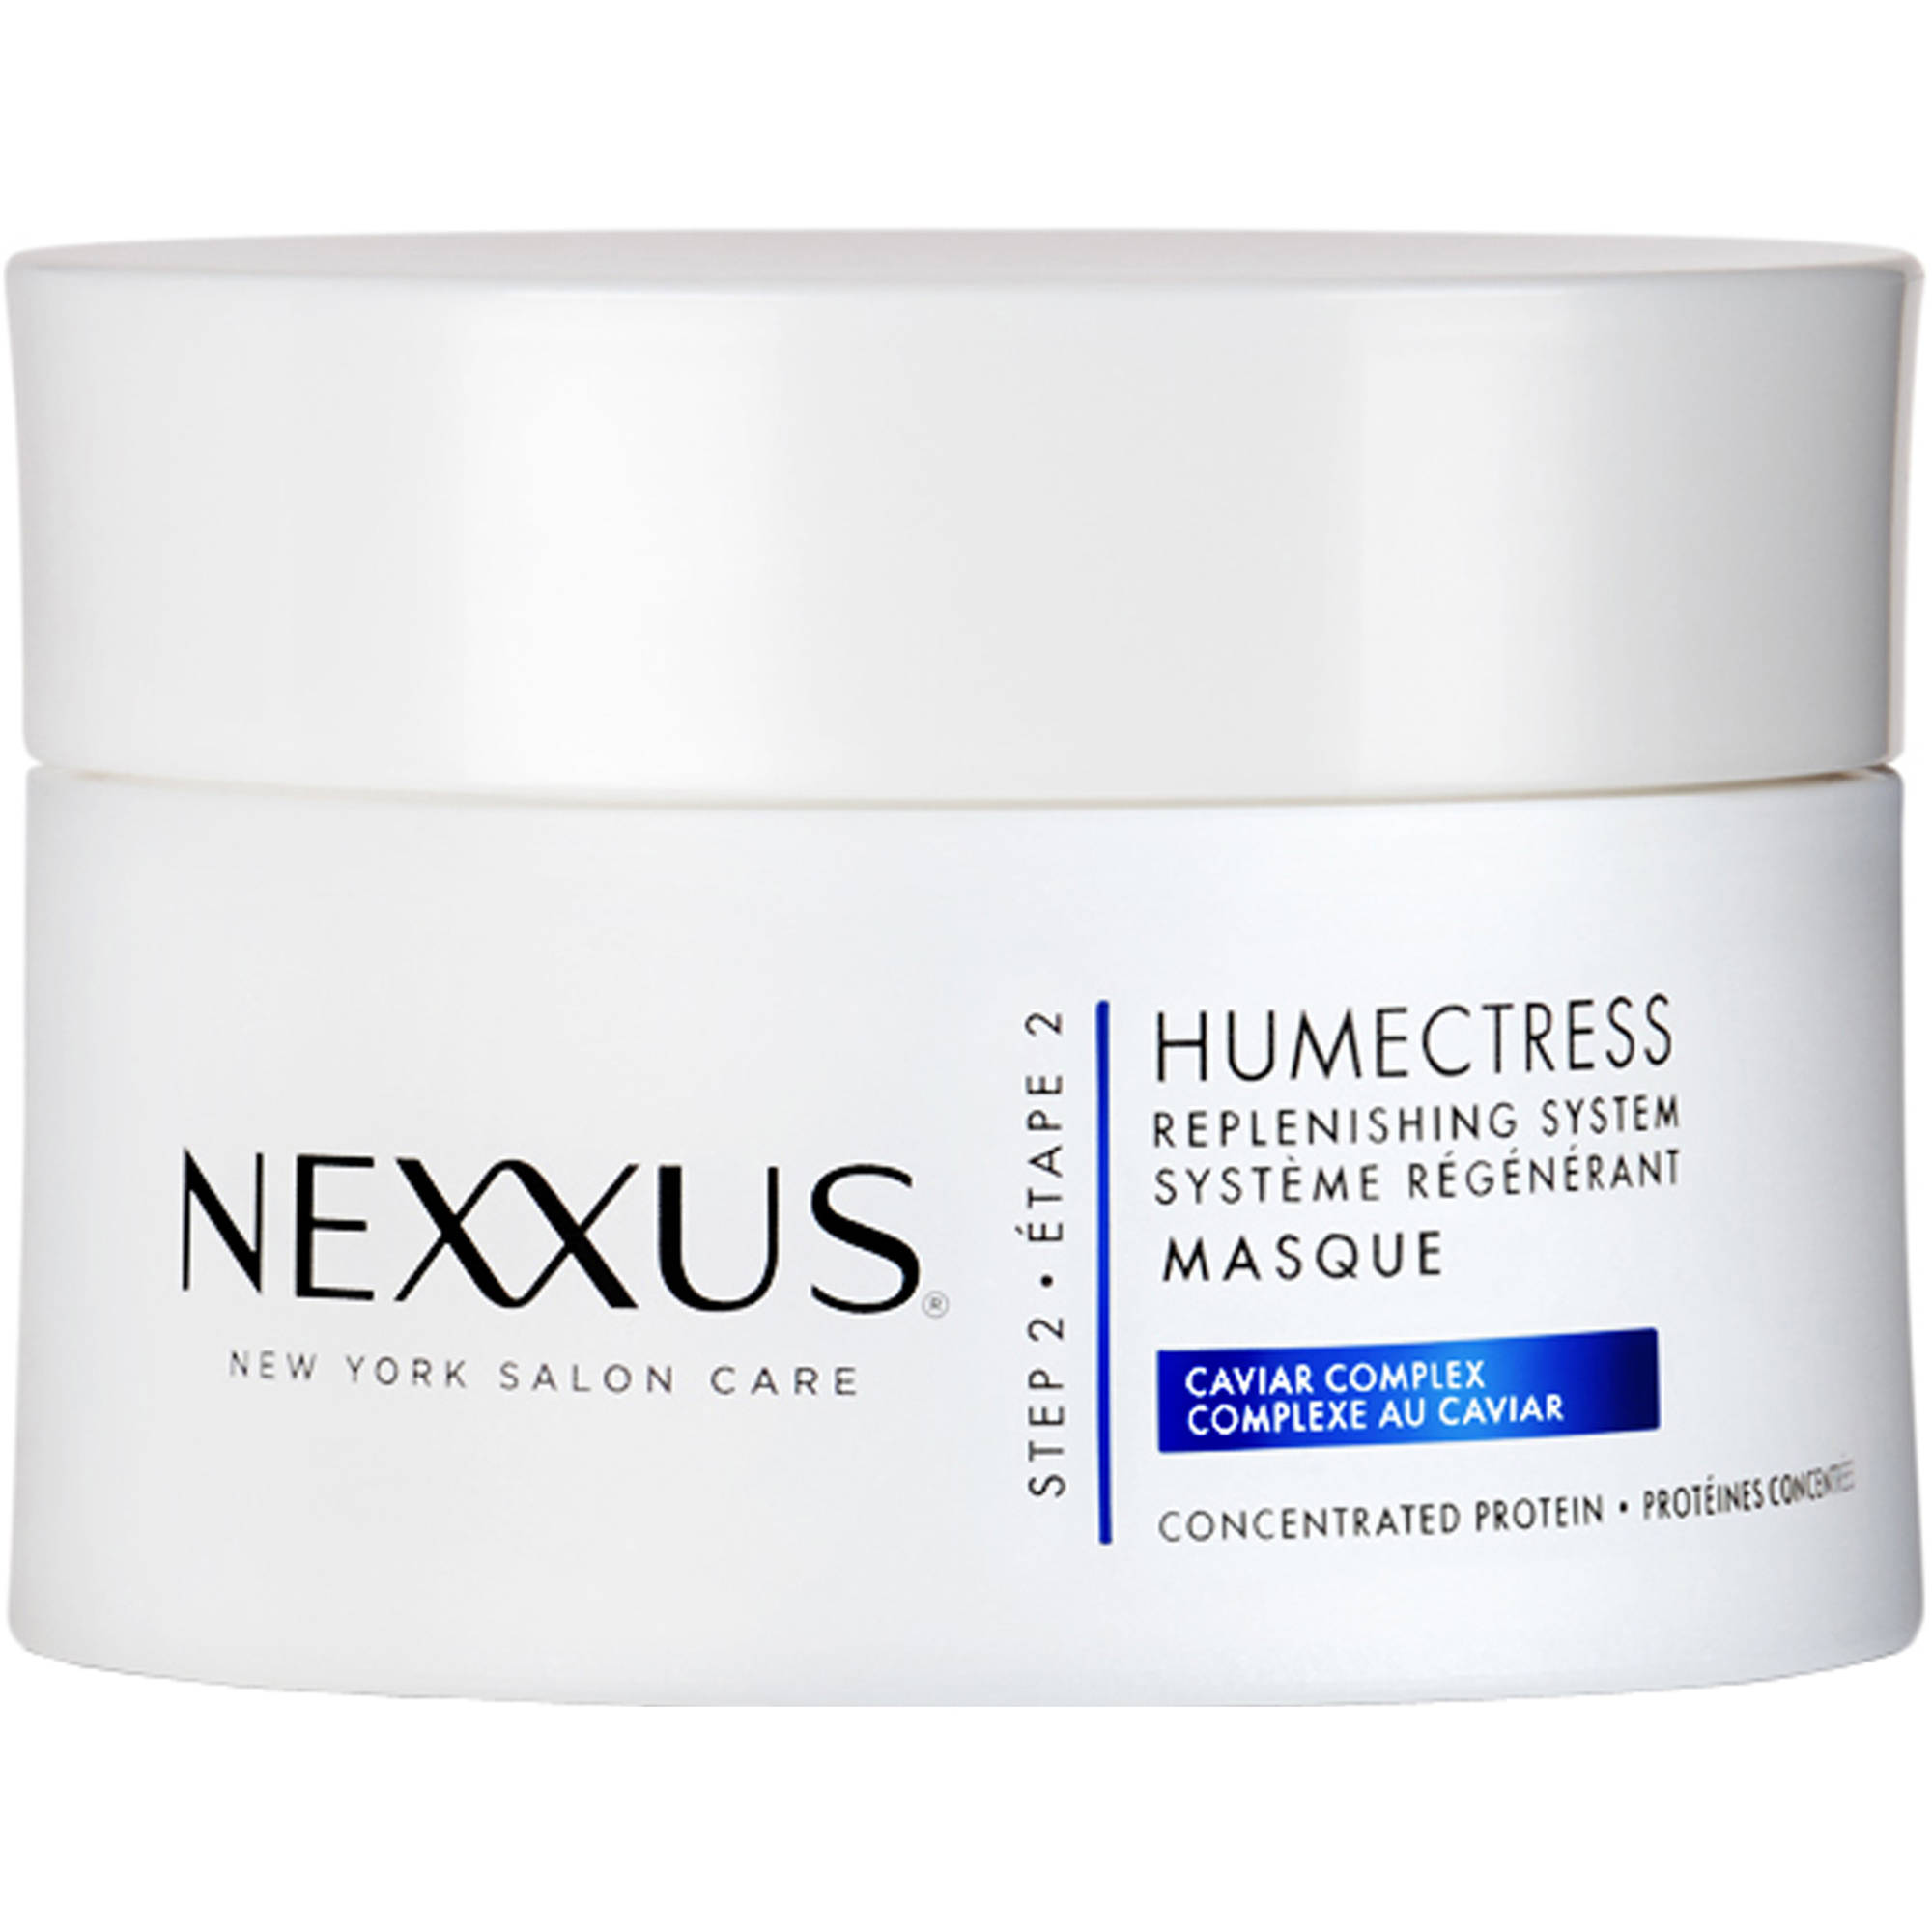 Nexxus Humectress Moisture Restoring Masque, 6.7 oz